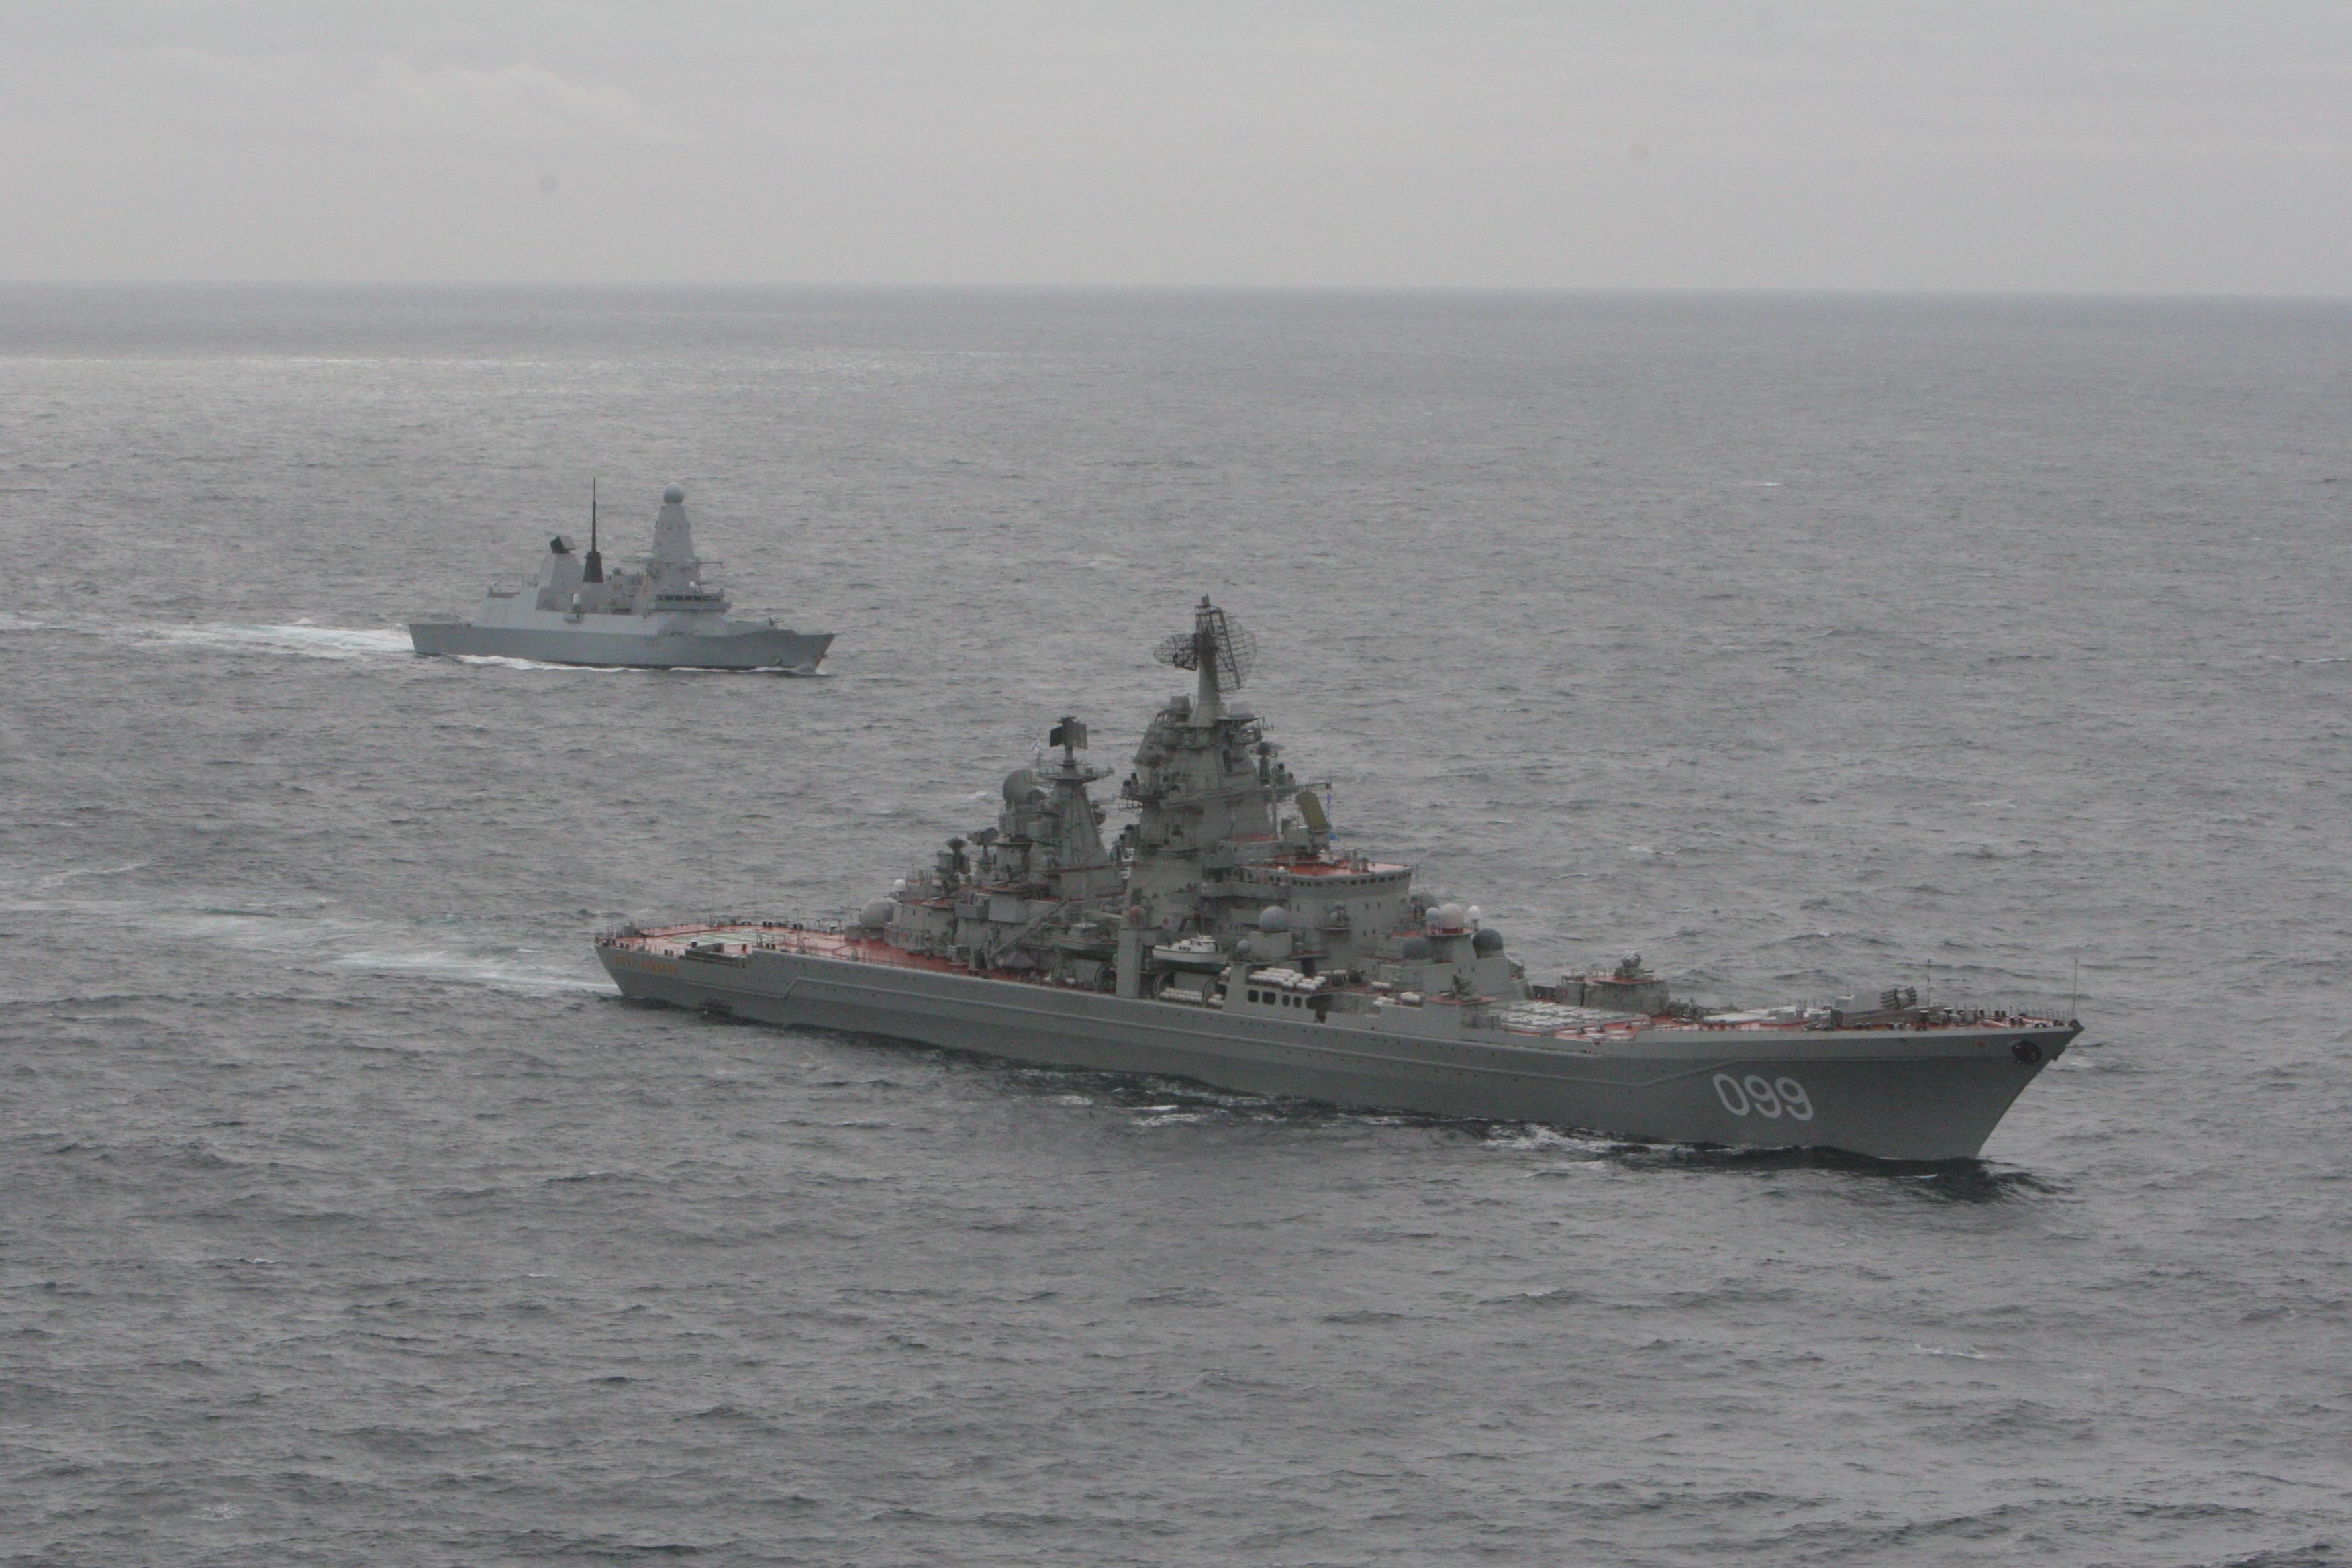 filehms dragon with kirov class pyotr velikiy mod 45157551jpg